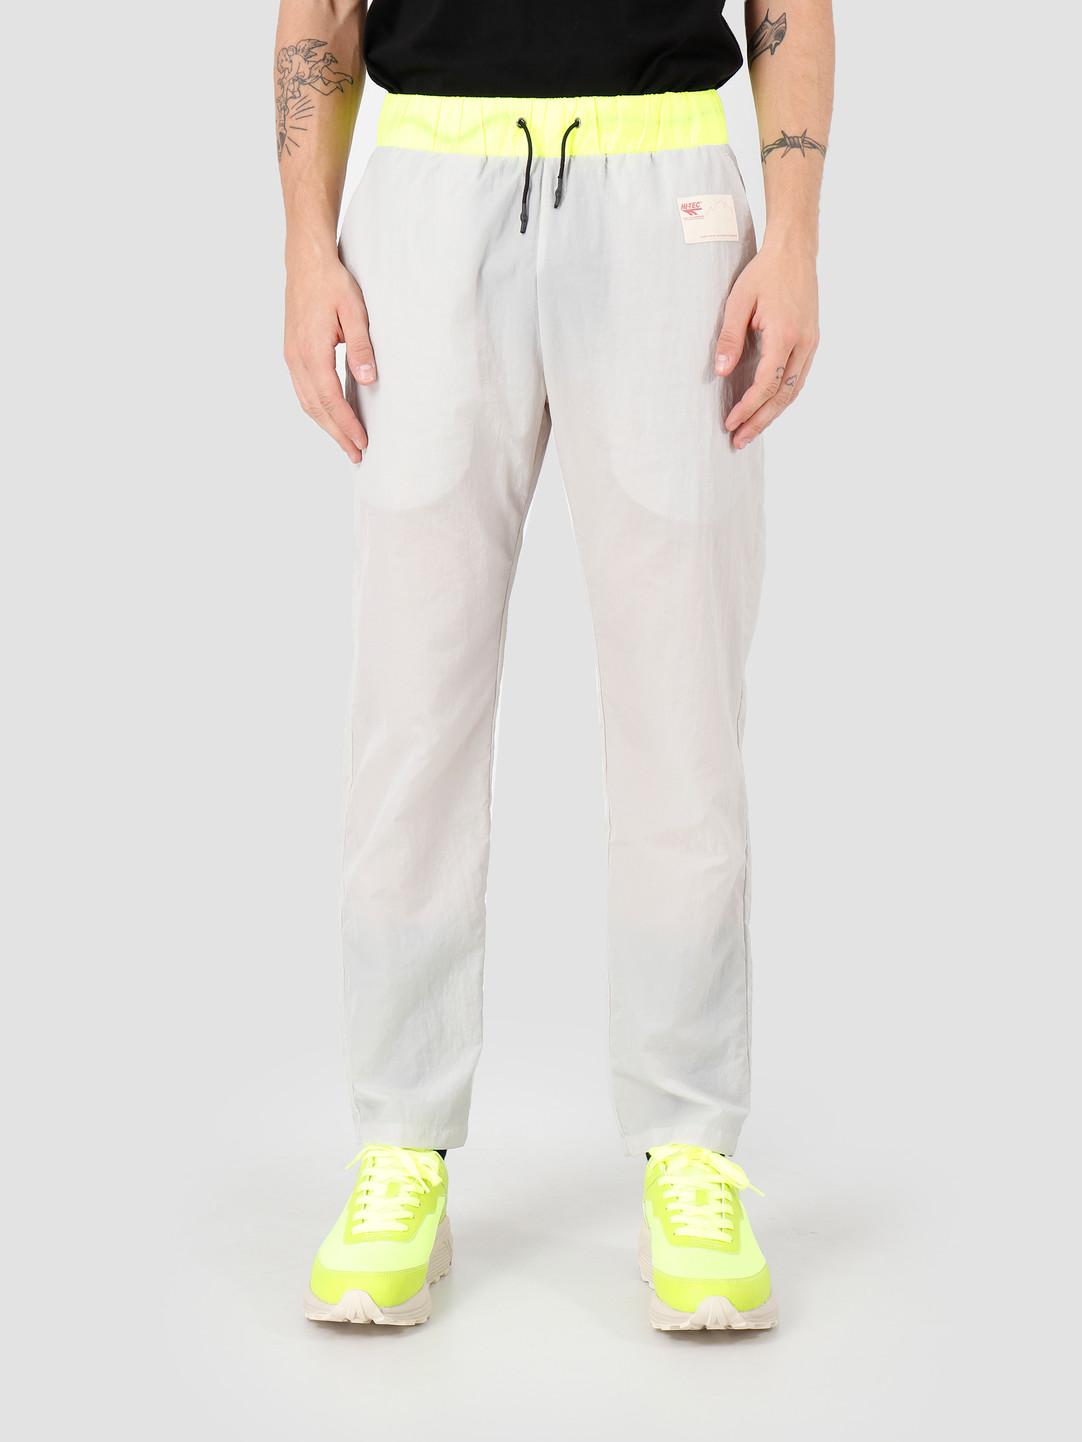 Hi-Tec Hi-Tec Day Trouser Grey Safety Yellow HAM064-051